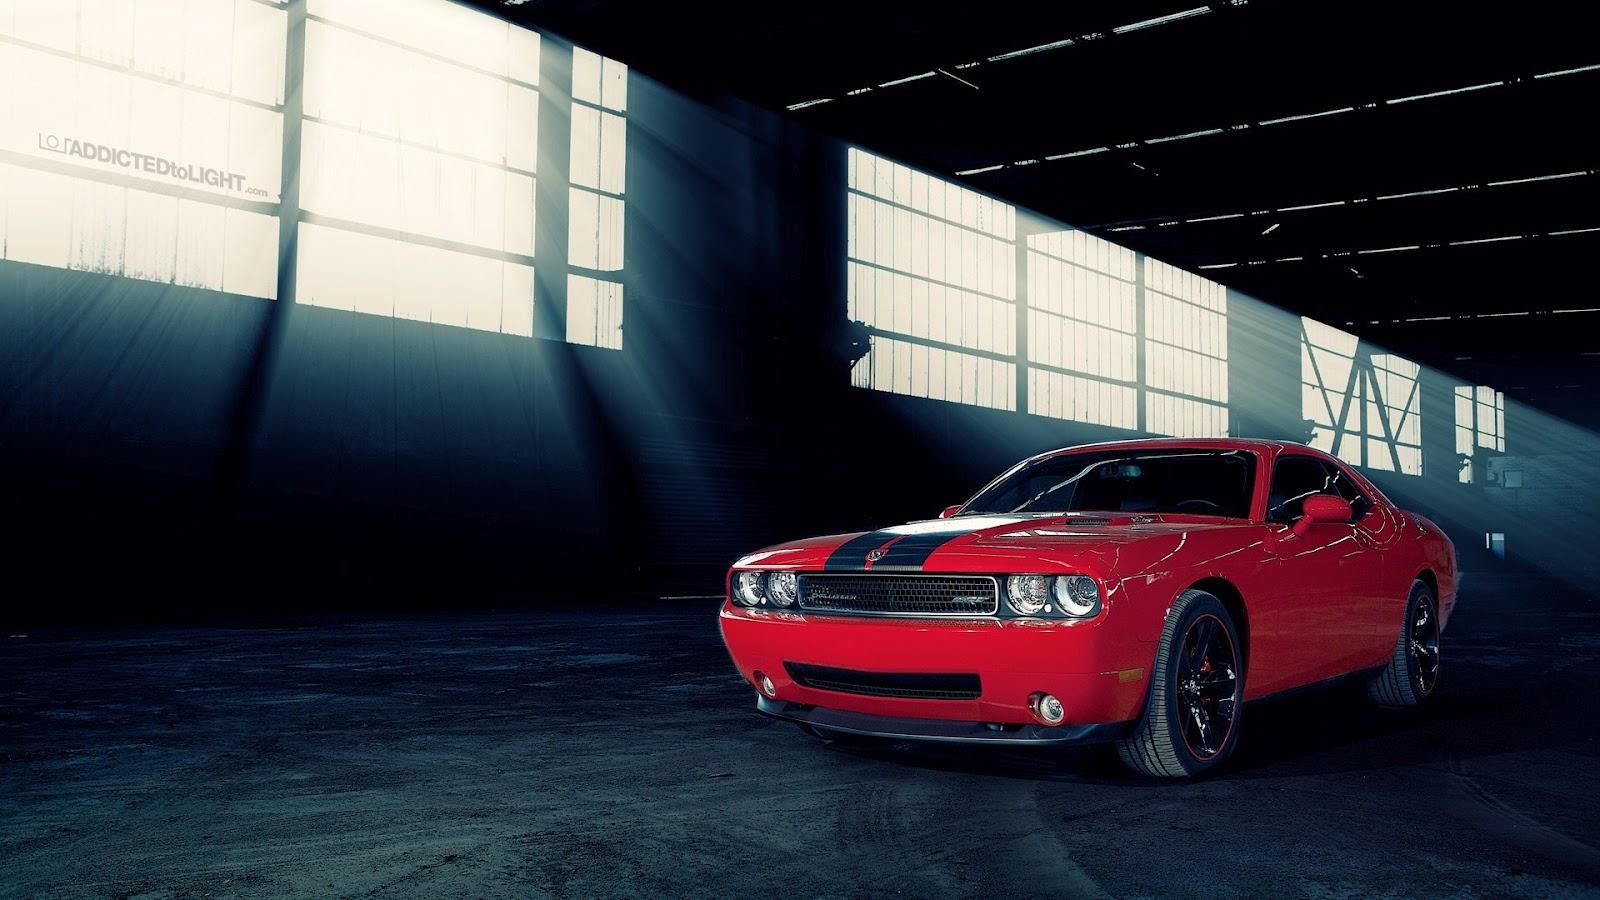 Dodge Challenger Srt Tuning Hd Wallpaper Hd Wallpapers Epic